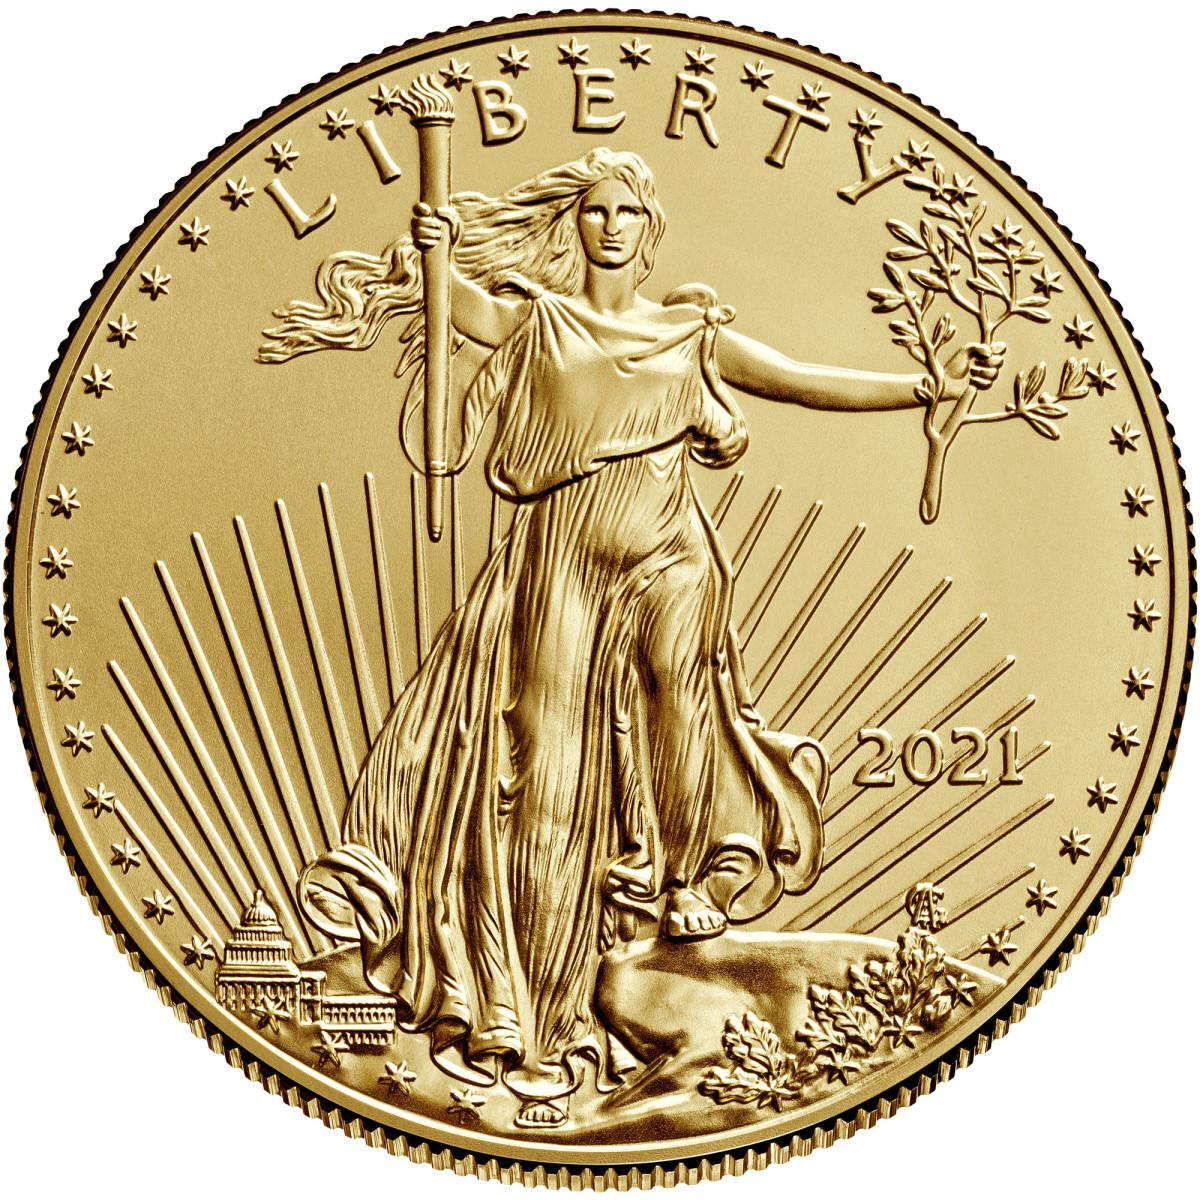 2021 one-ounce American Eagle gold bullion coin. (Image courtesy U.S. Mint.)